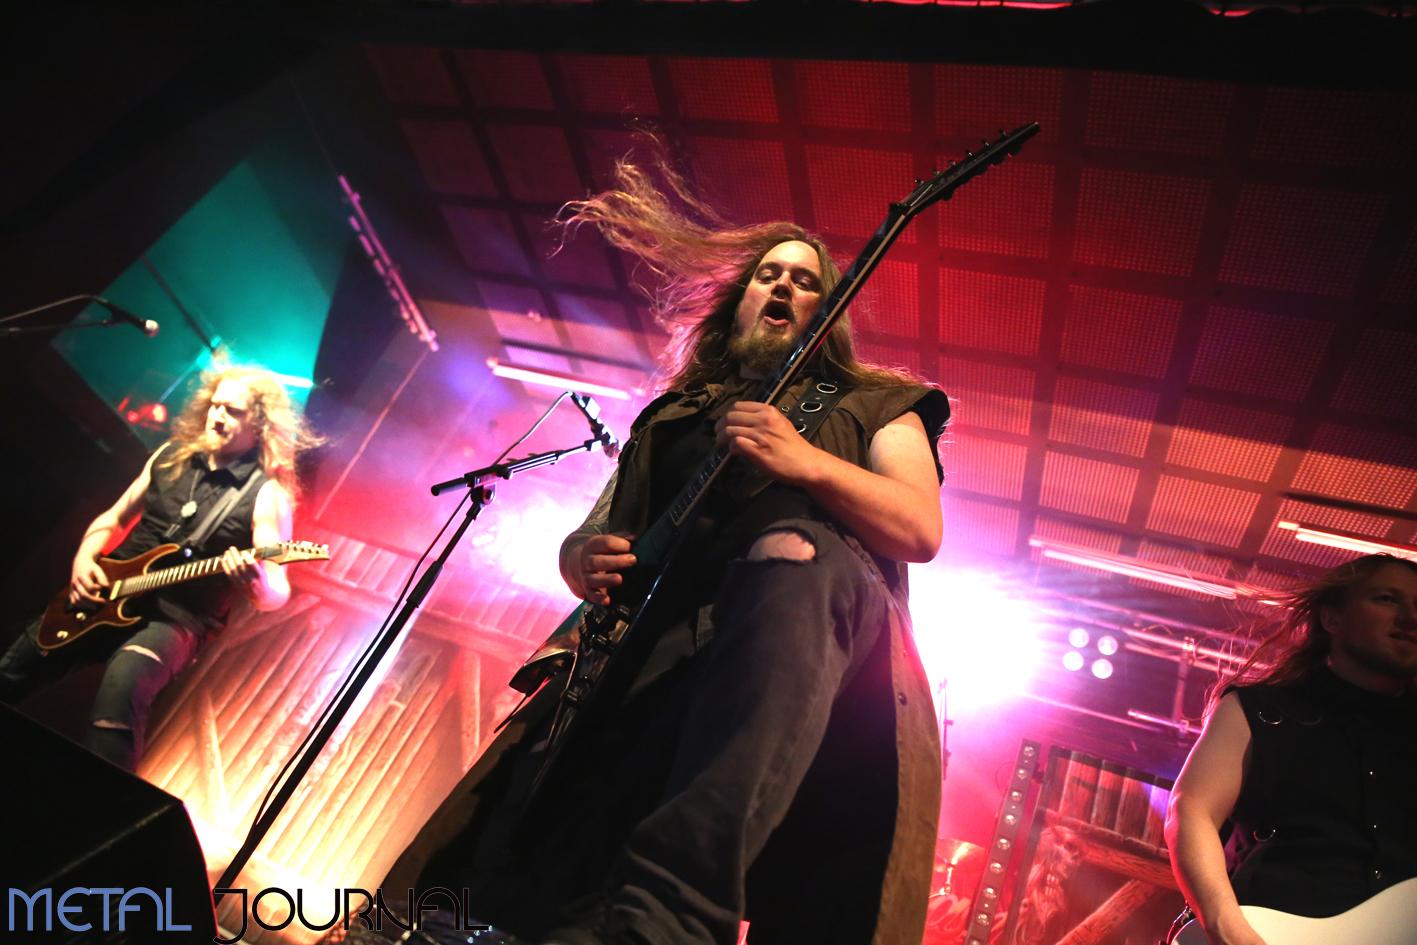 orden ogan - metal journal 2017 pic 5